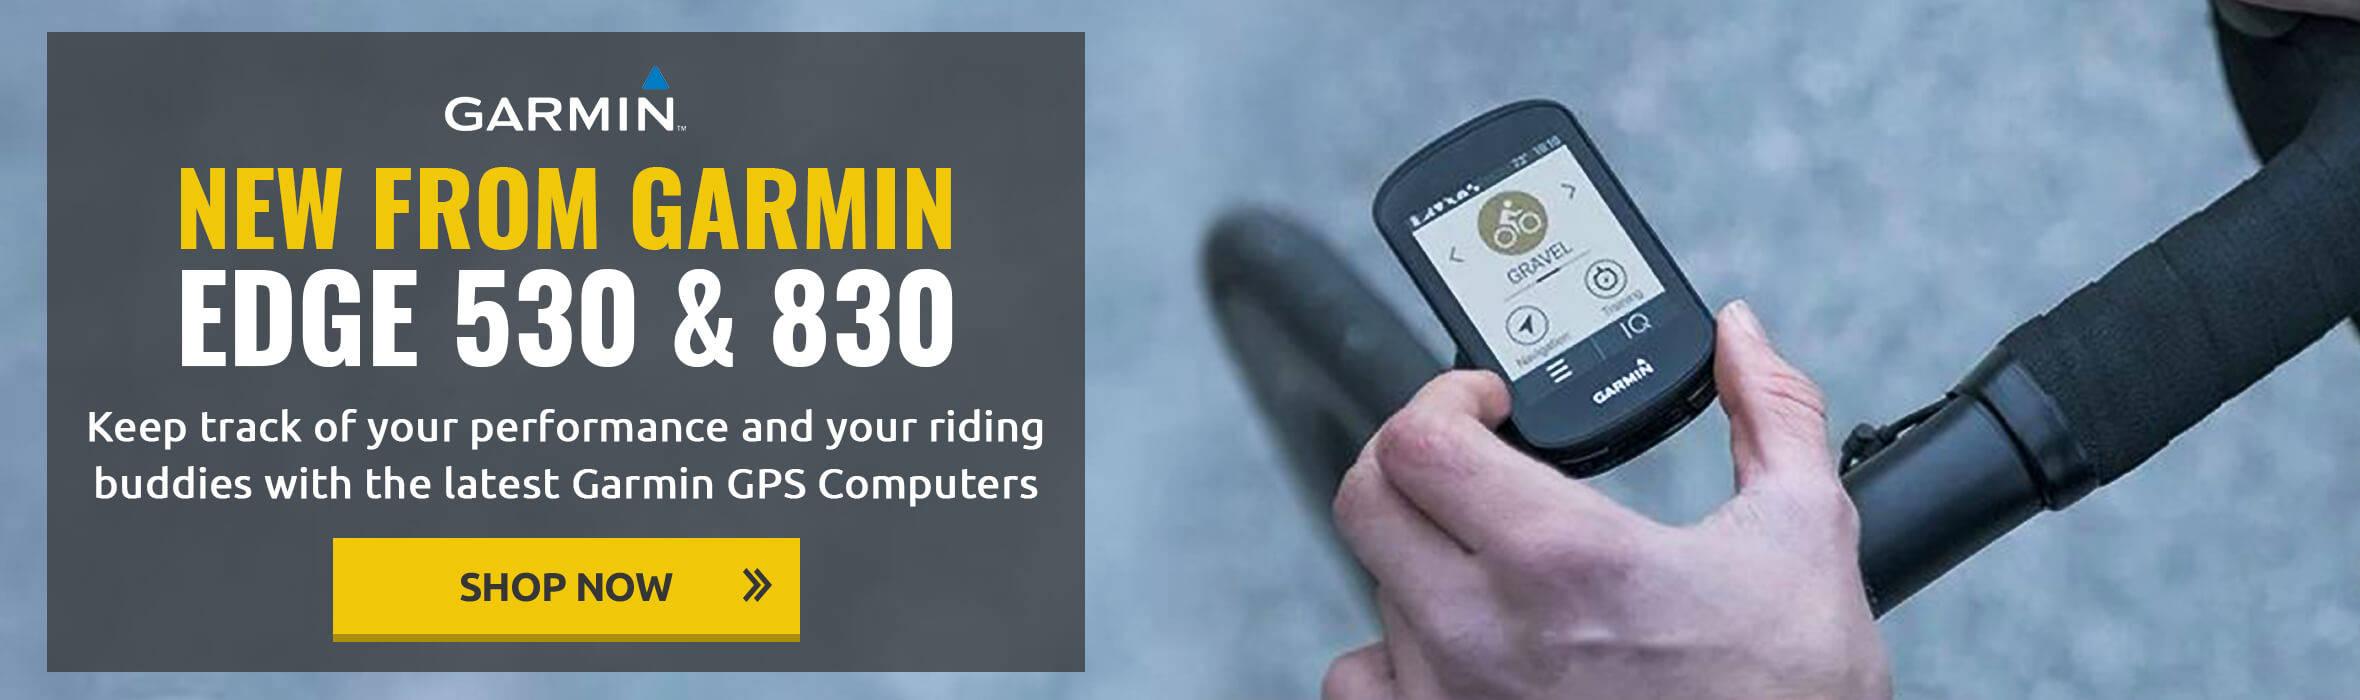 New Garmin Edge 530 & 830